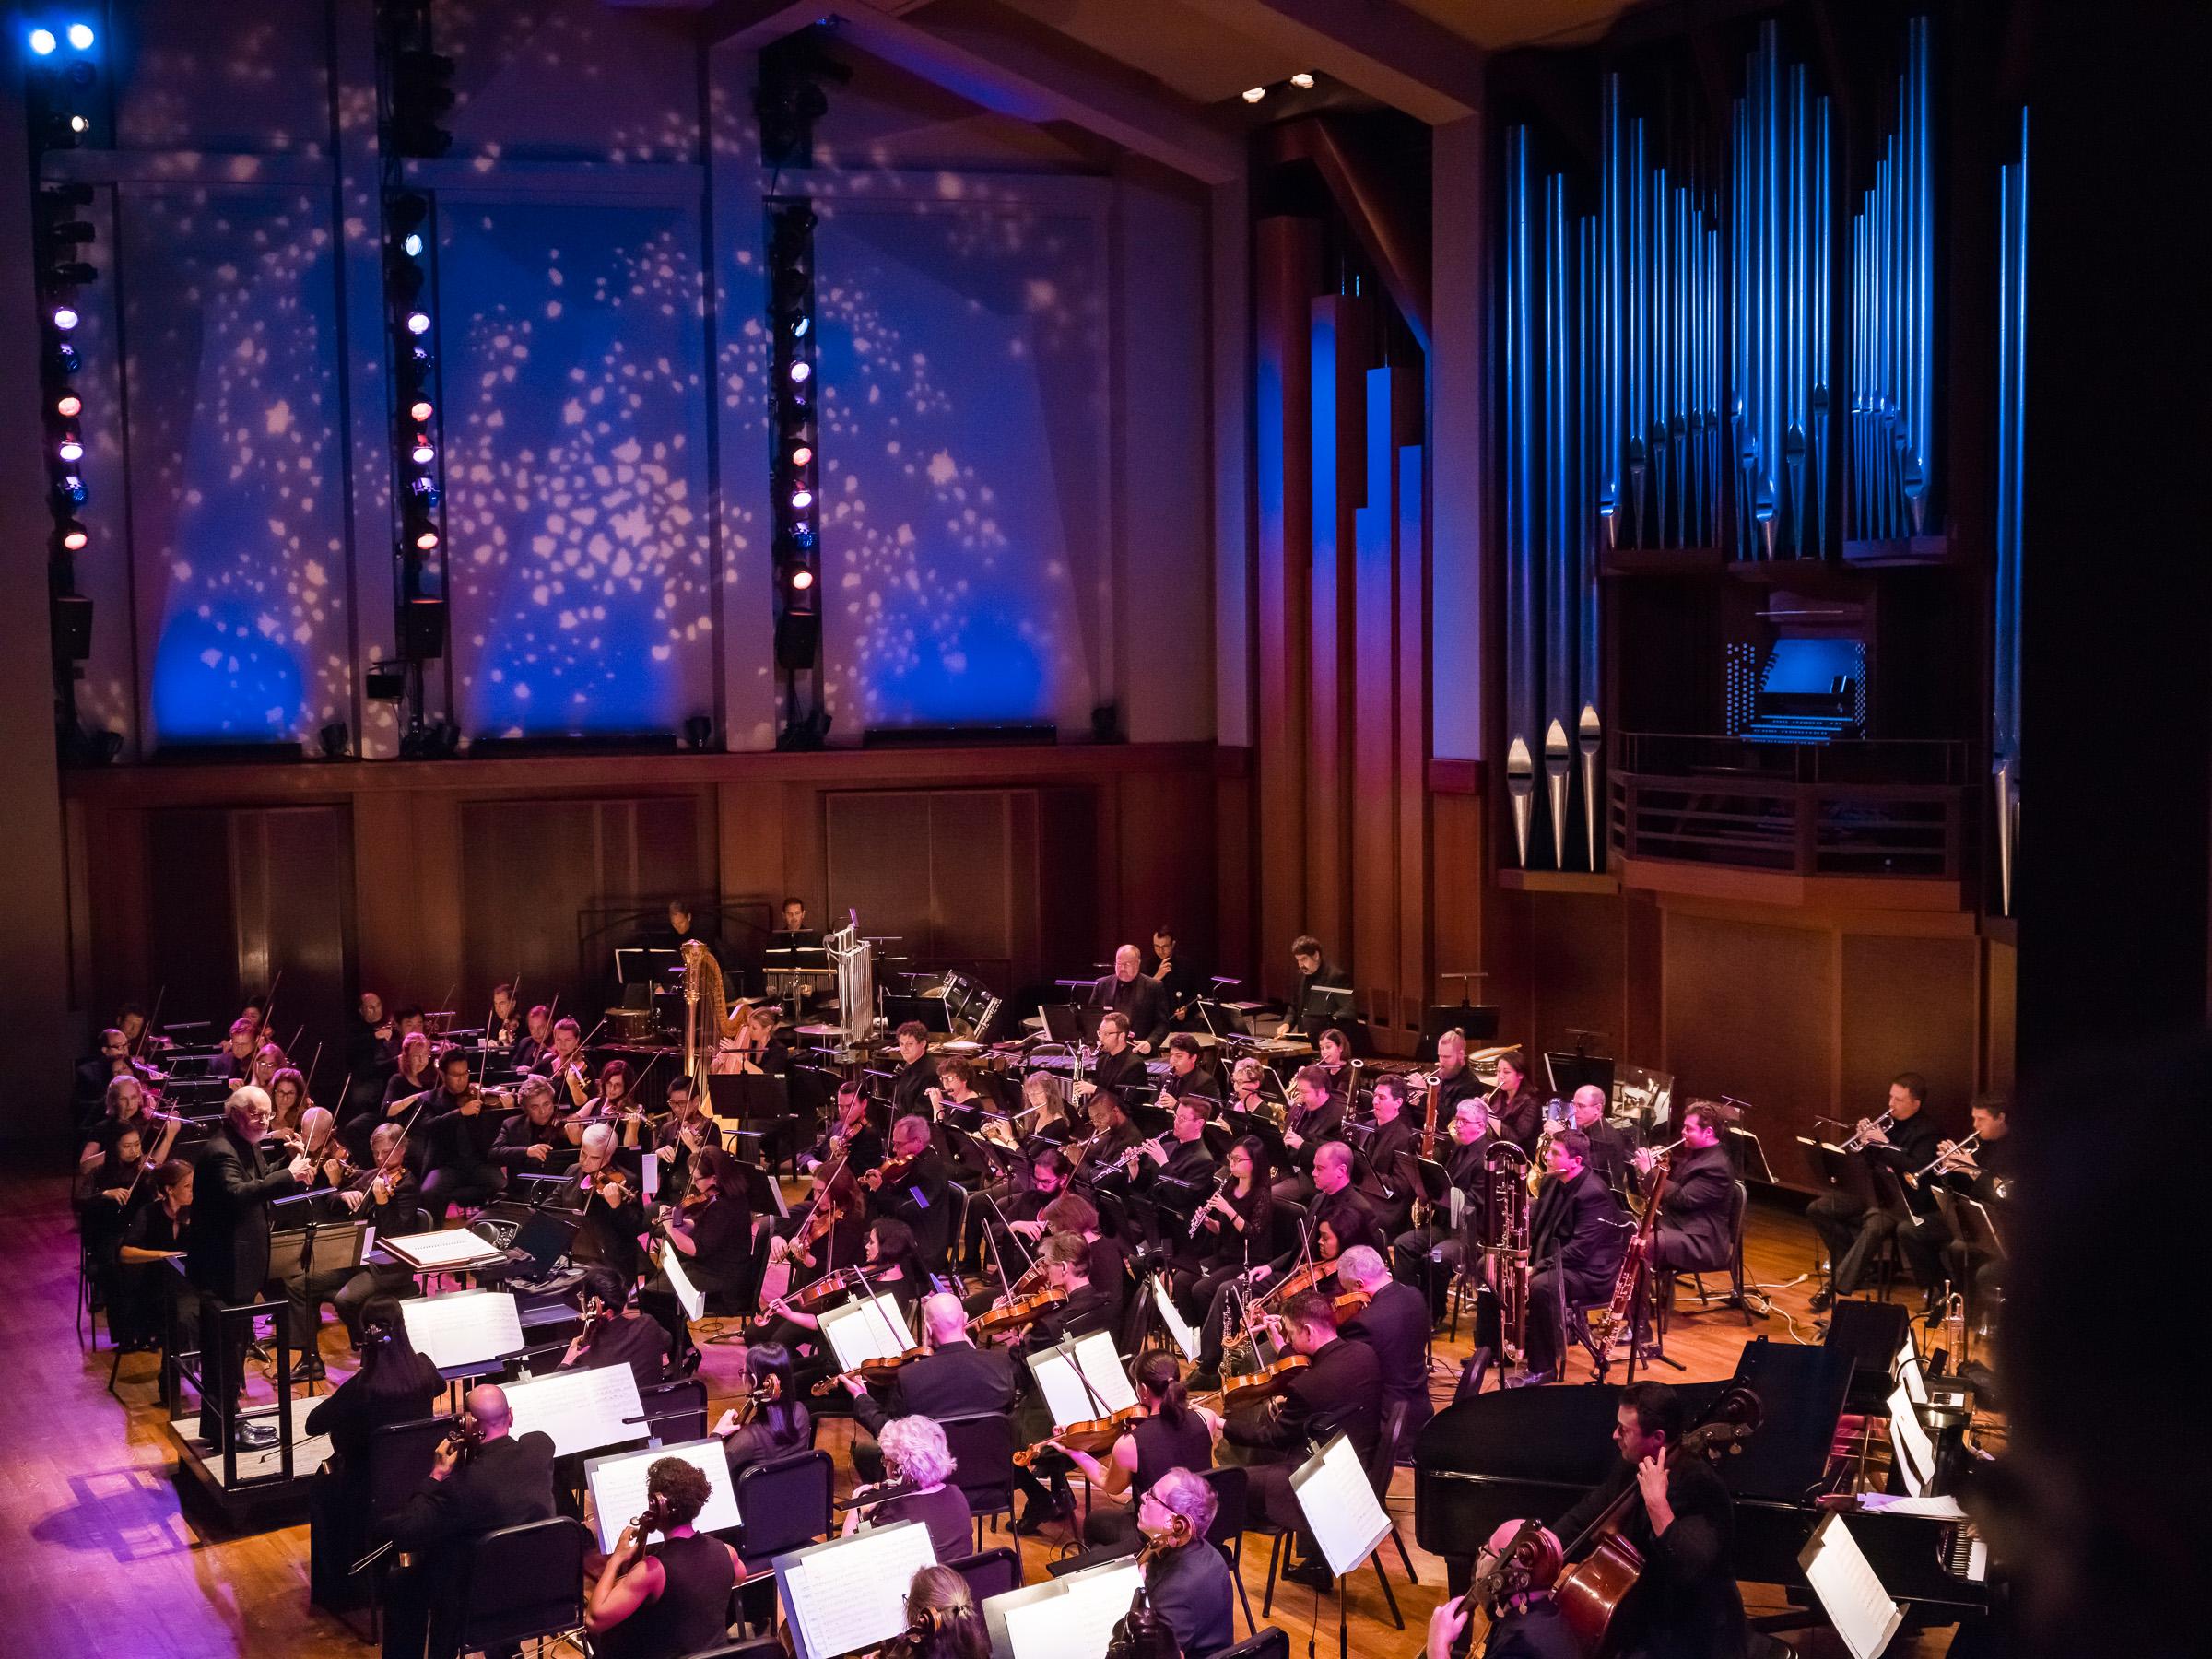 brandon_patoc_john_williams_Steven_Spielberg, Seattle_Symphony_Orchestra_Conert_0062.jpg